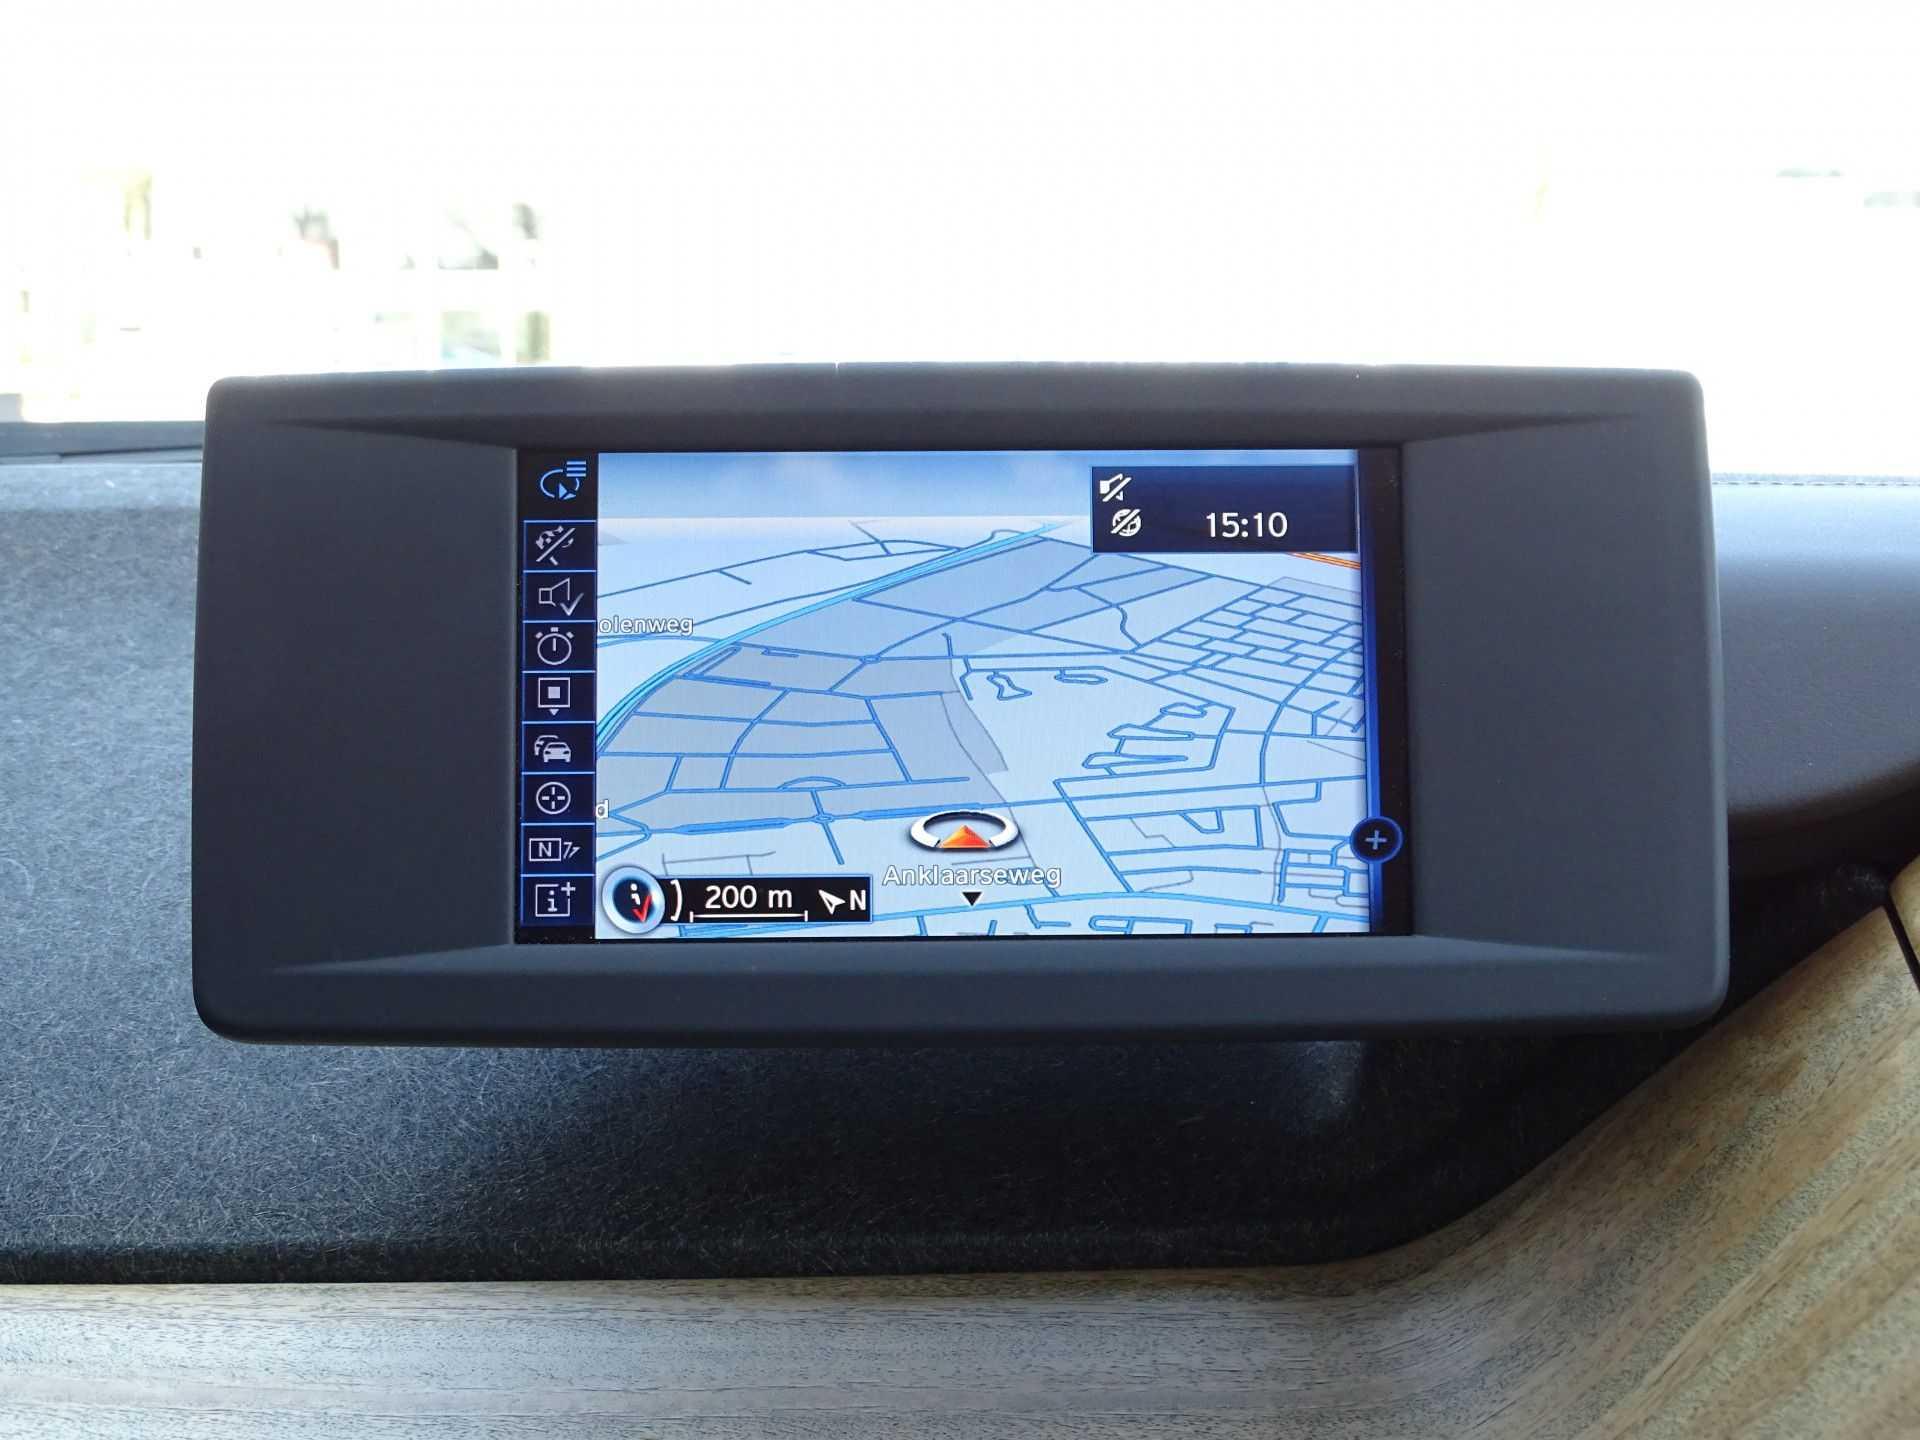 BMW i3 Basis Comfort Advance 22 kWh Marge Warmtepomp Navigatie Clima Cruise Panorama afbeelding 5